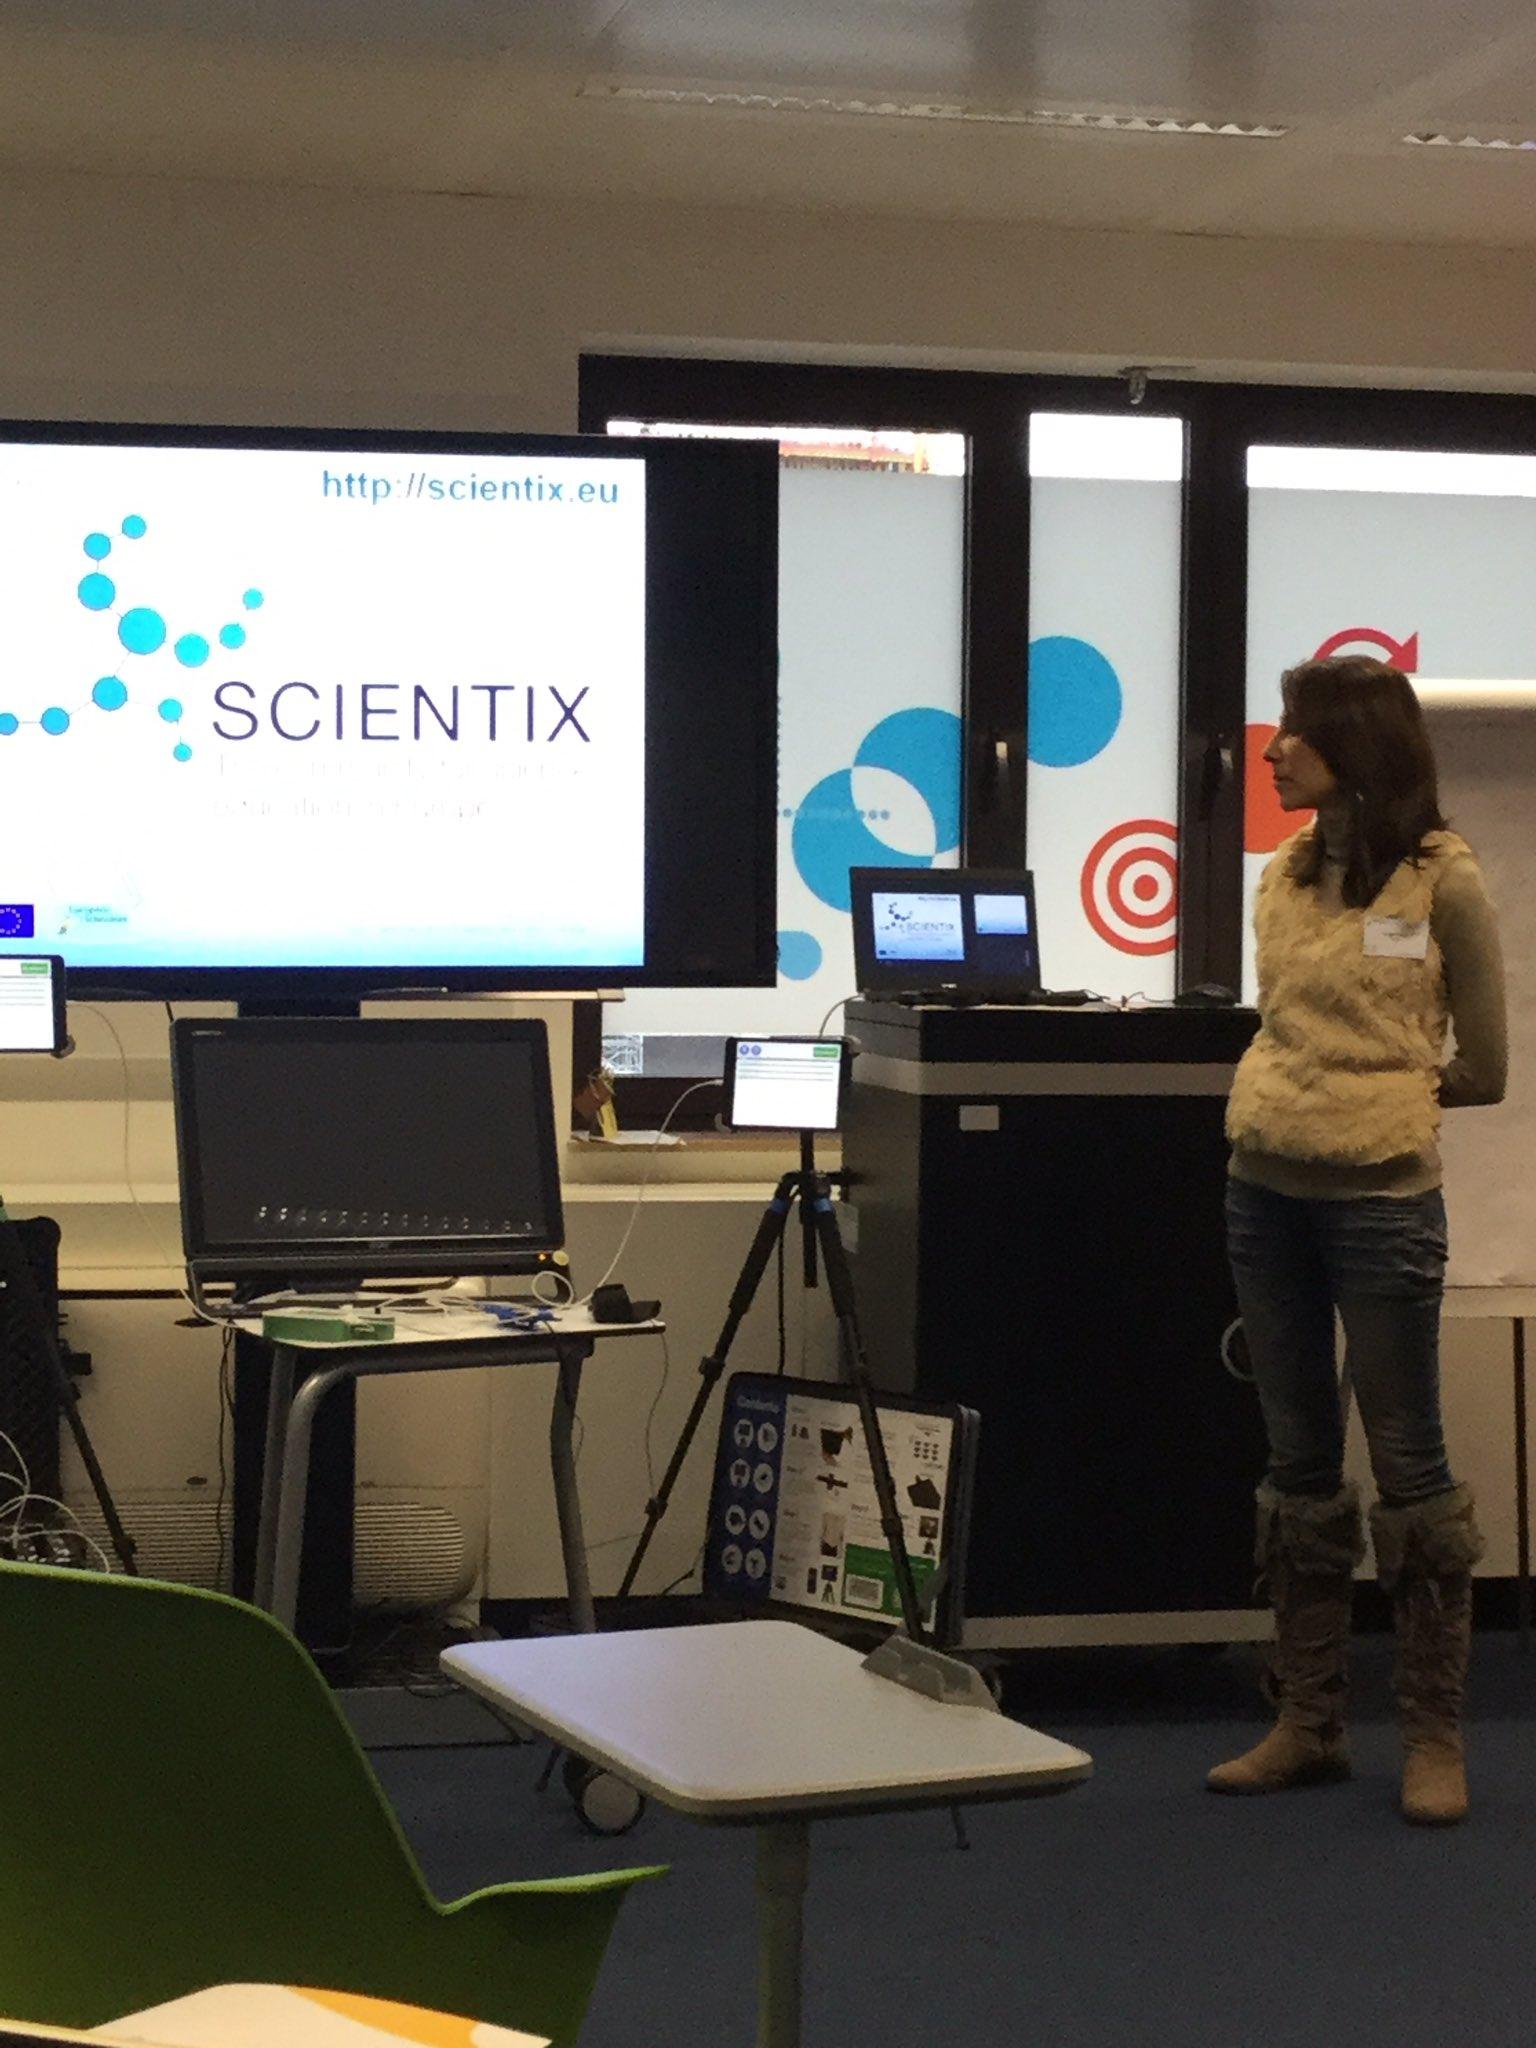 @ArgyriPanagiota introducing to ITC admin workshop one of my preferite project #Scientix #AllSTEMScientix https://t.co/awRlxc8vho